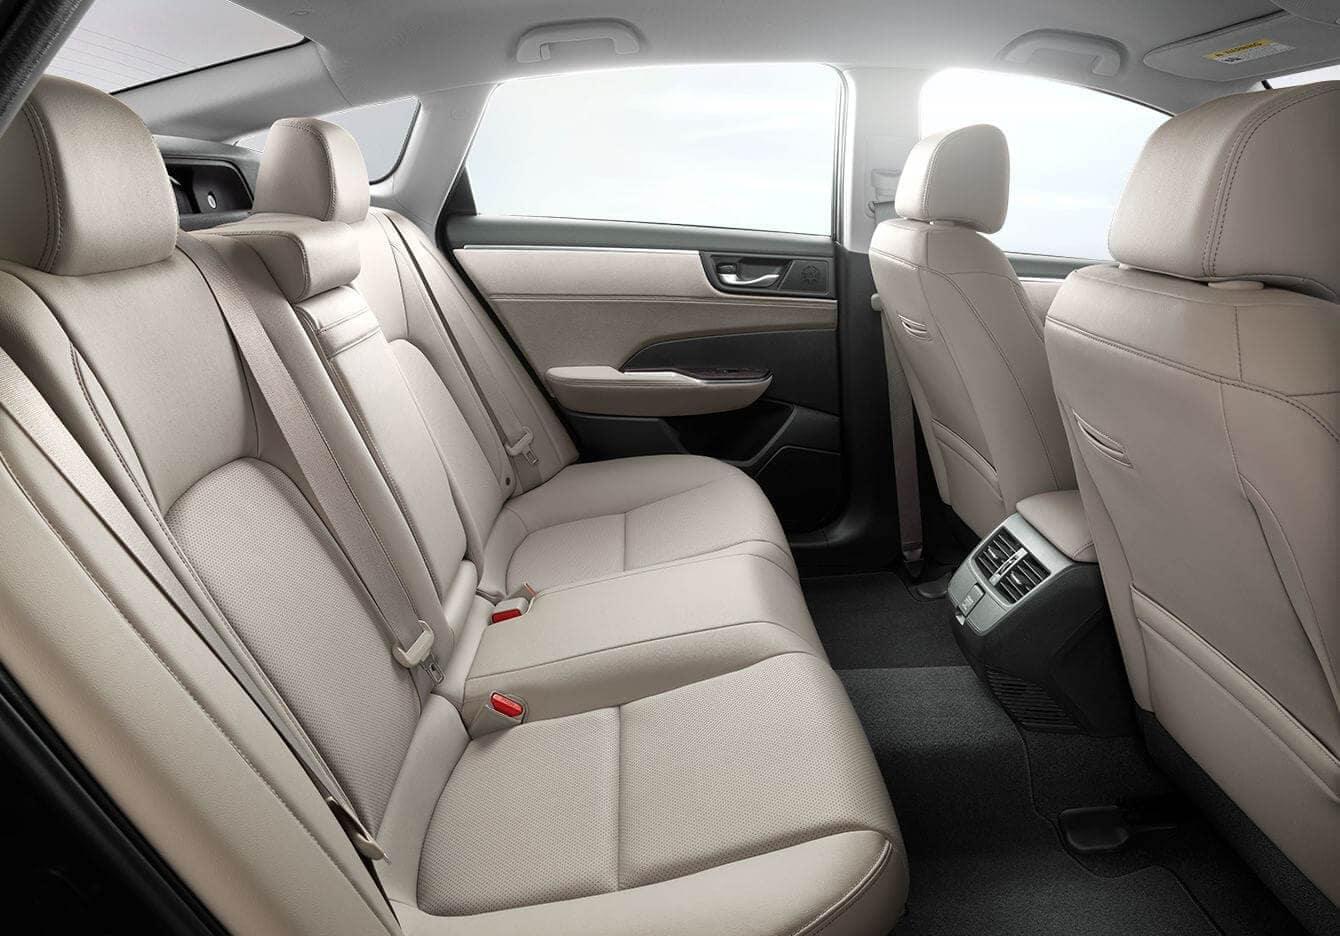 2018 Honda Clarity Plug-In Hybrid Interior Rear Seating